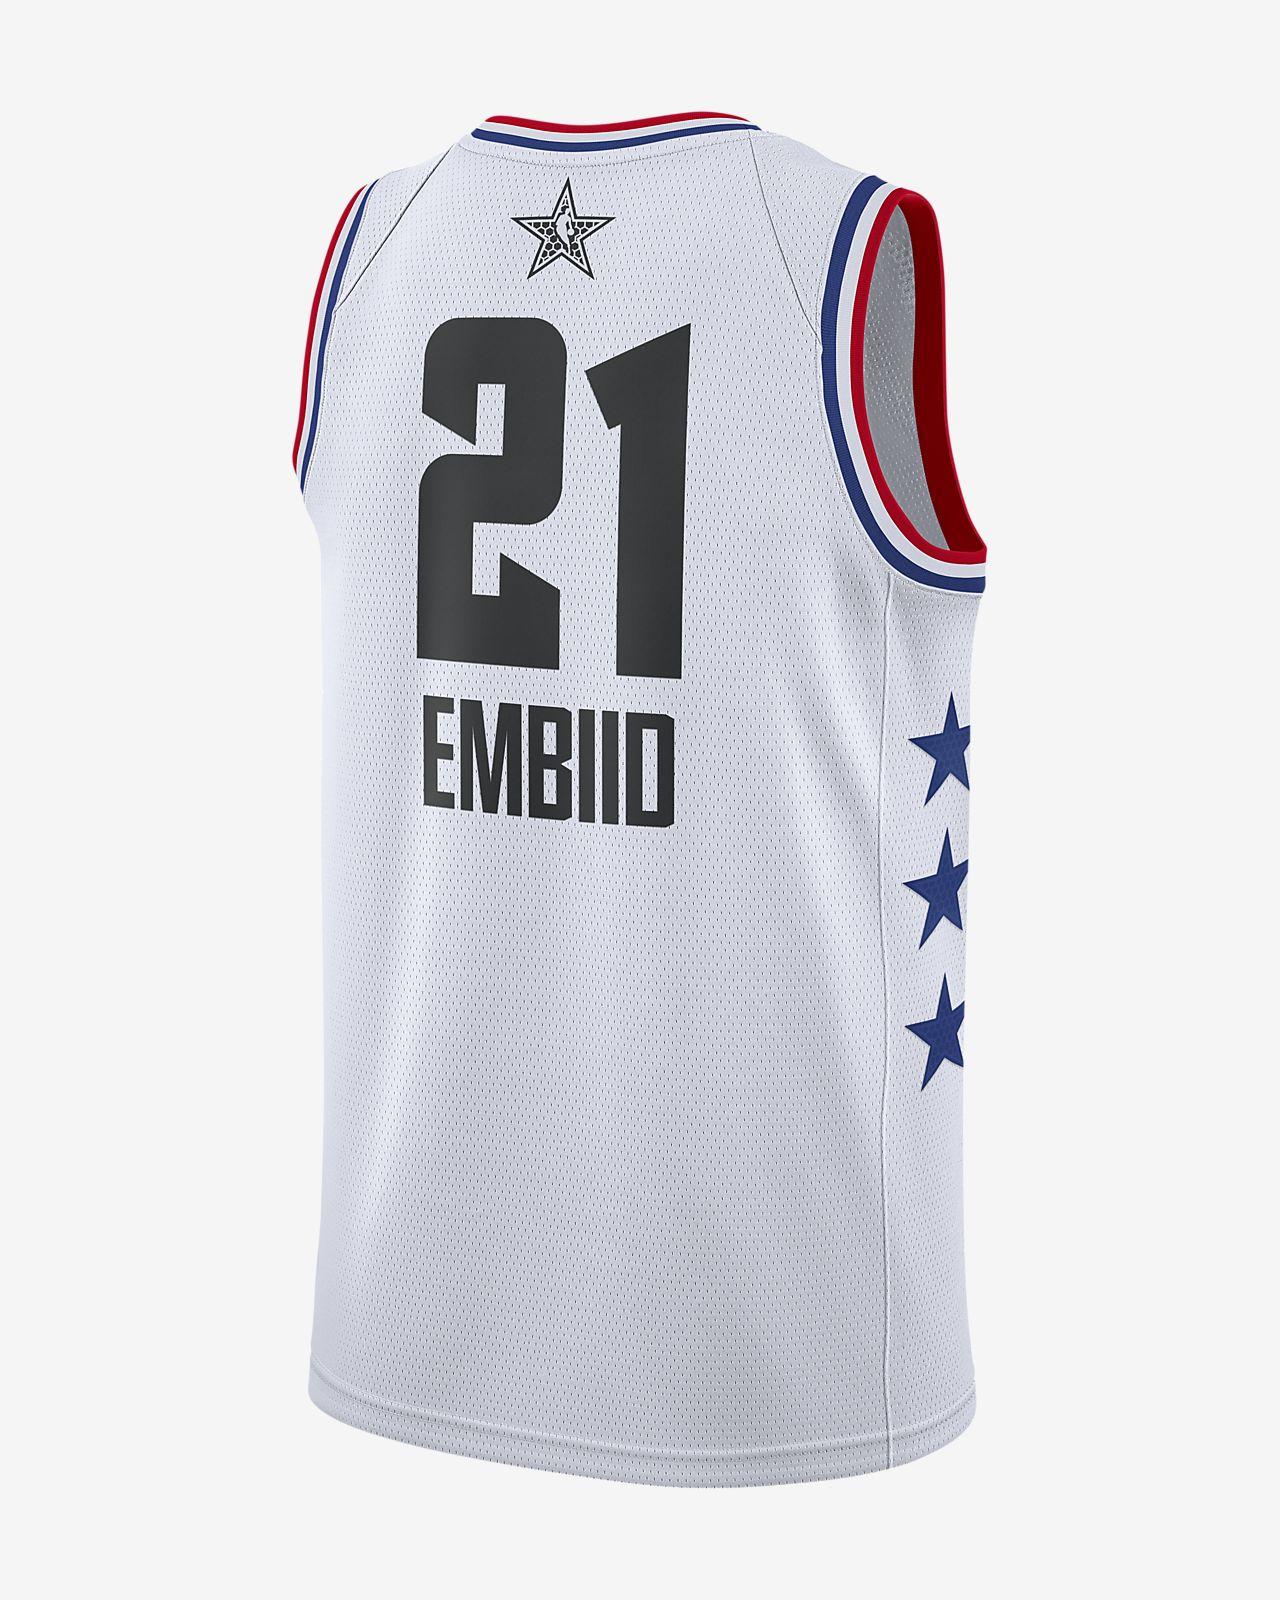 15a6a5cf45777c All-Star Edition Swingman Men s Jordan NBA Connected Jersey. Nike.com